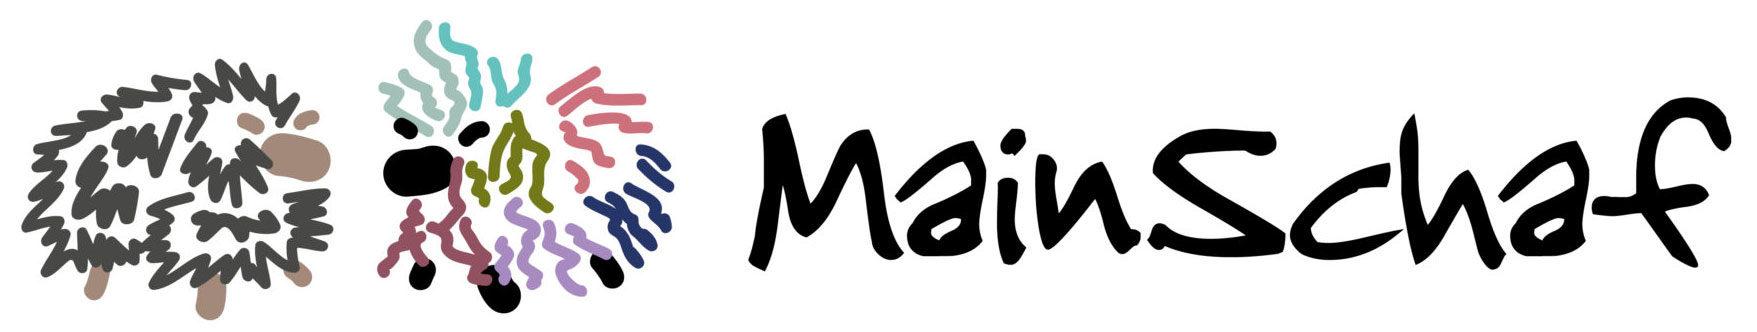 Möbel – Designobjekt – Haustier | MainSchaf